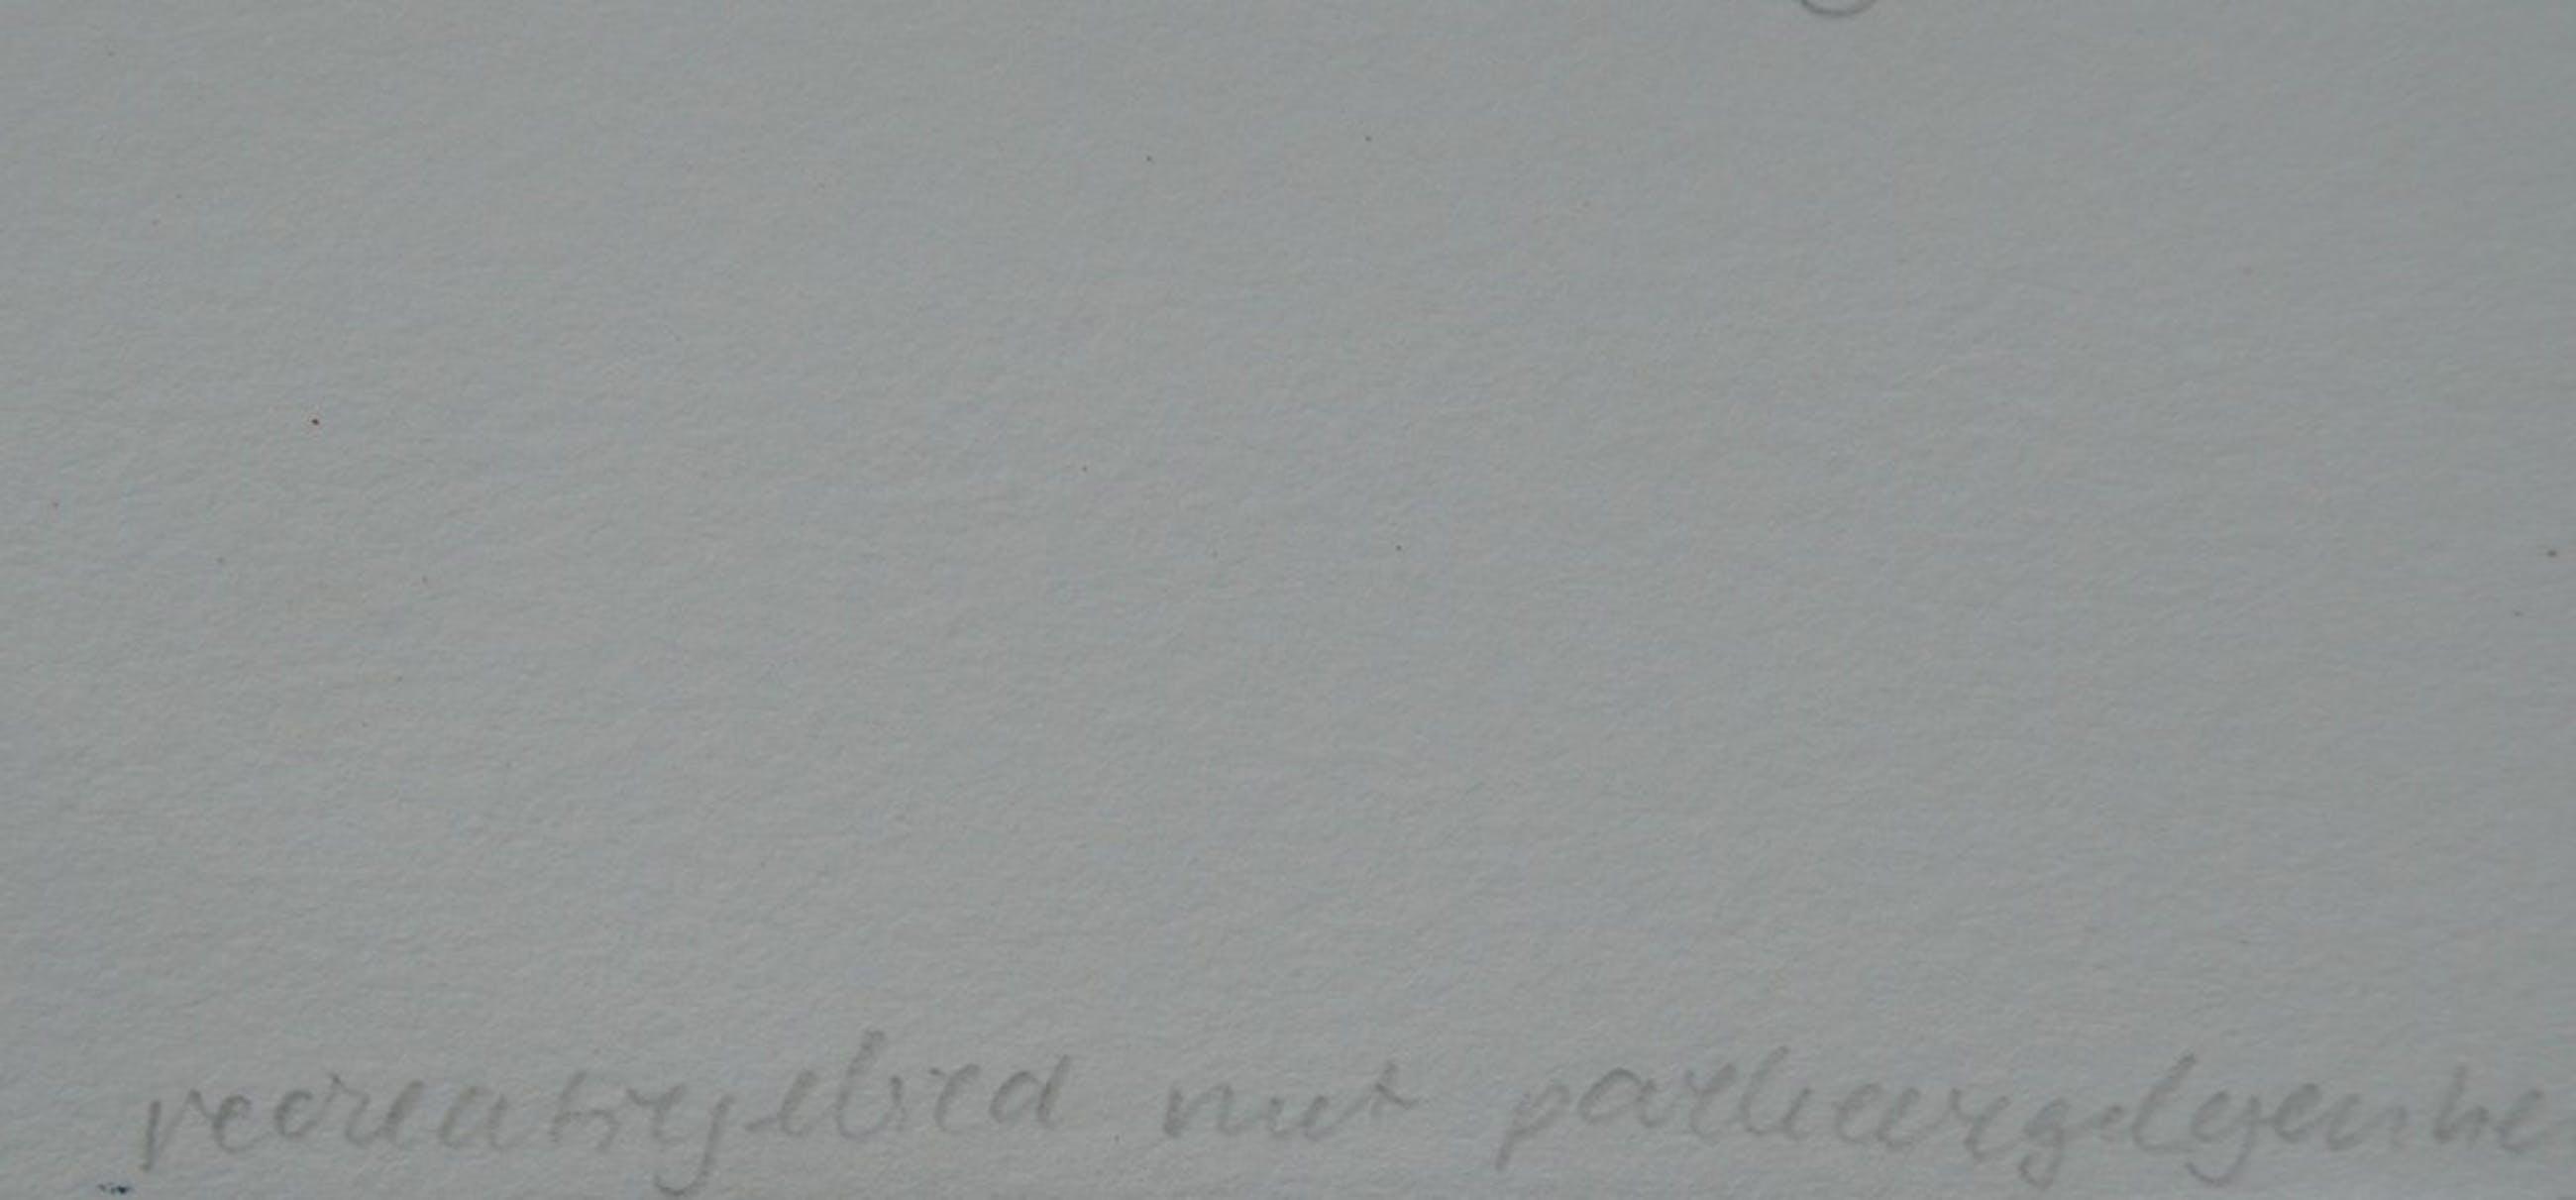 Caroline J.T. Gresnigt - gesigneerde litho - 2003 kopen? Bied vanaf 1!